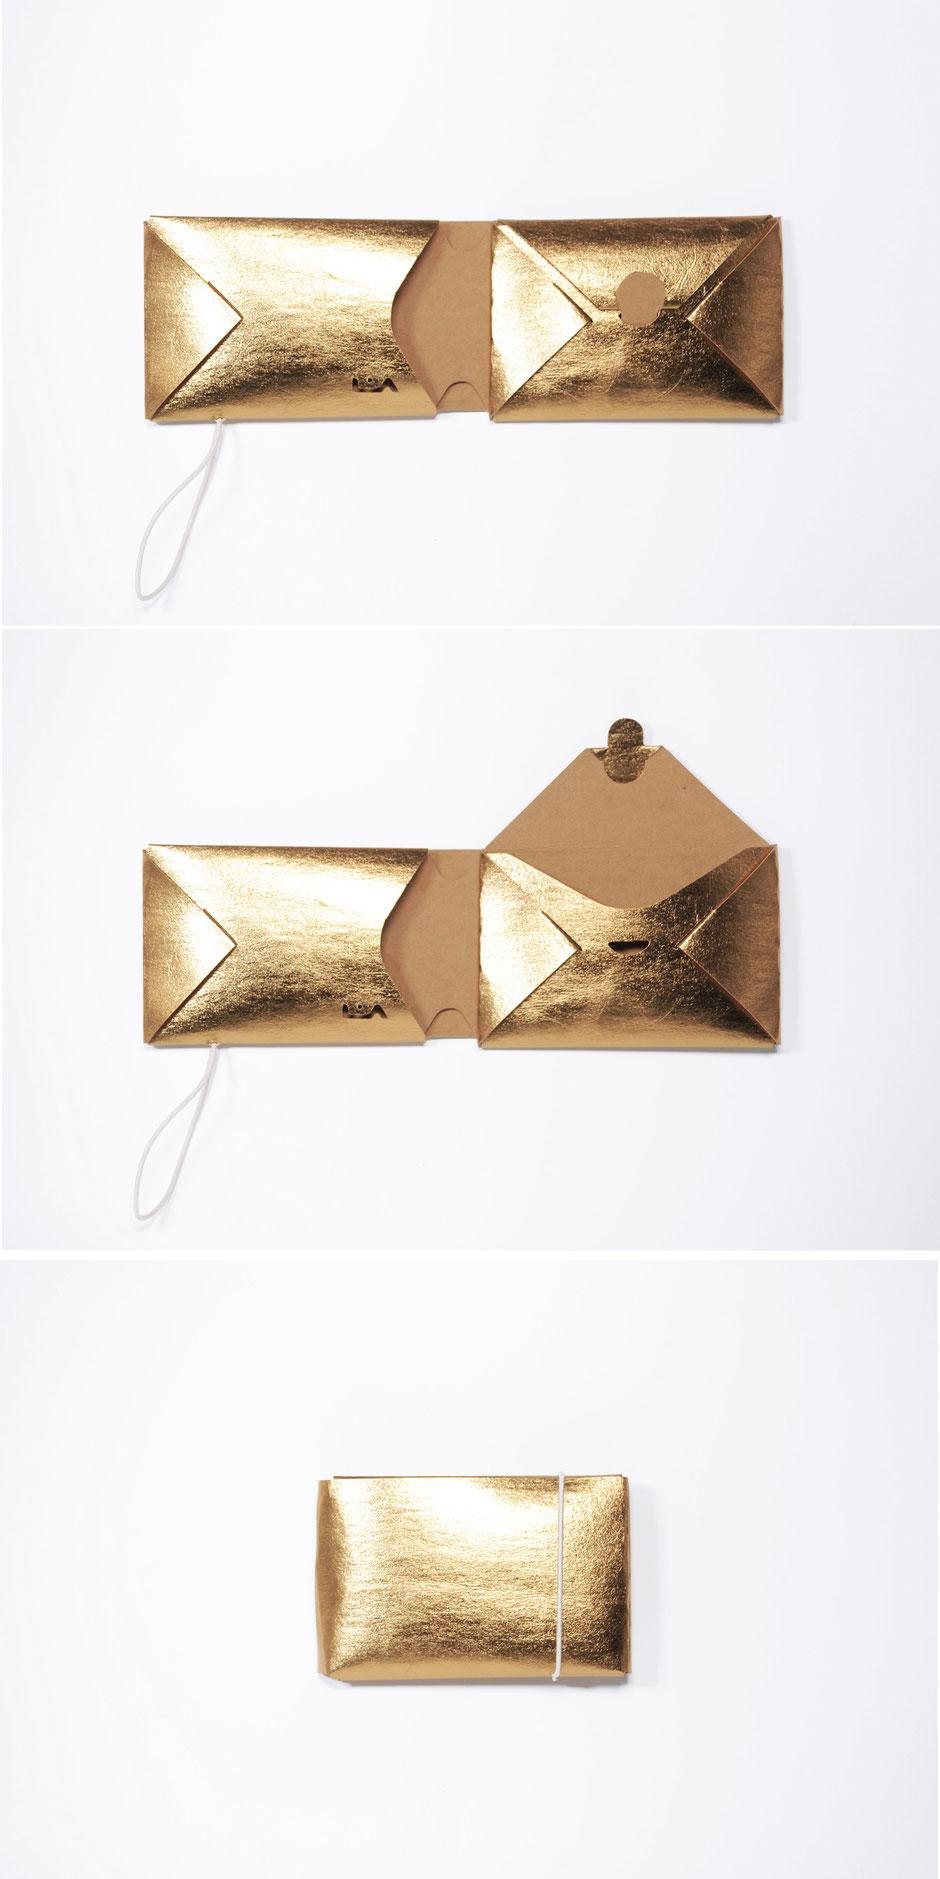 liaform Portemonnaie REM gold/natur | Vegane Mini Origami Geldbörse | vegan mini oriami purse/wallet | Portefeuille Vegan Mini Origami